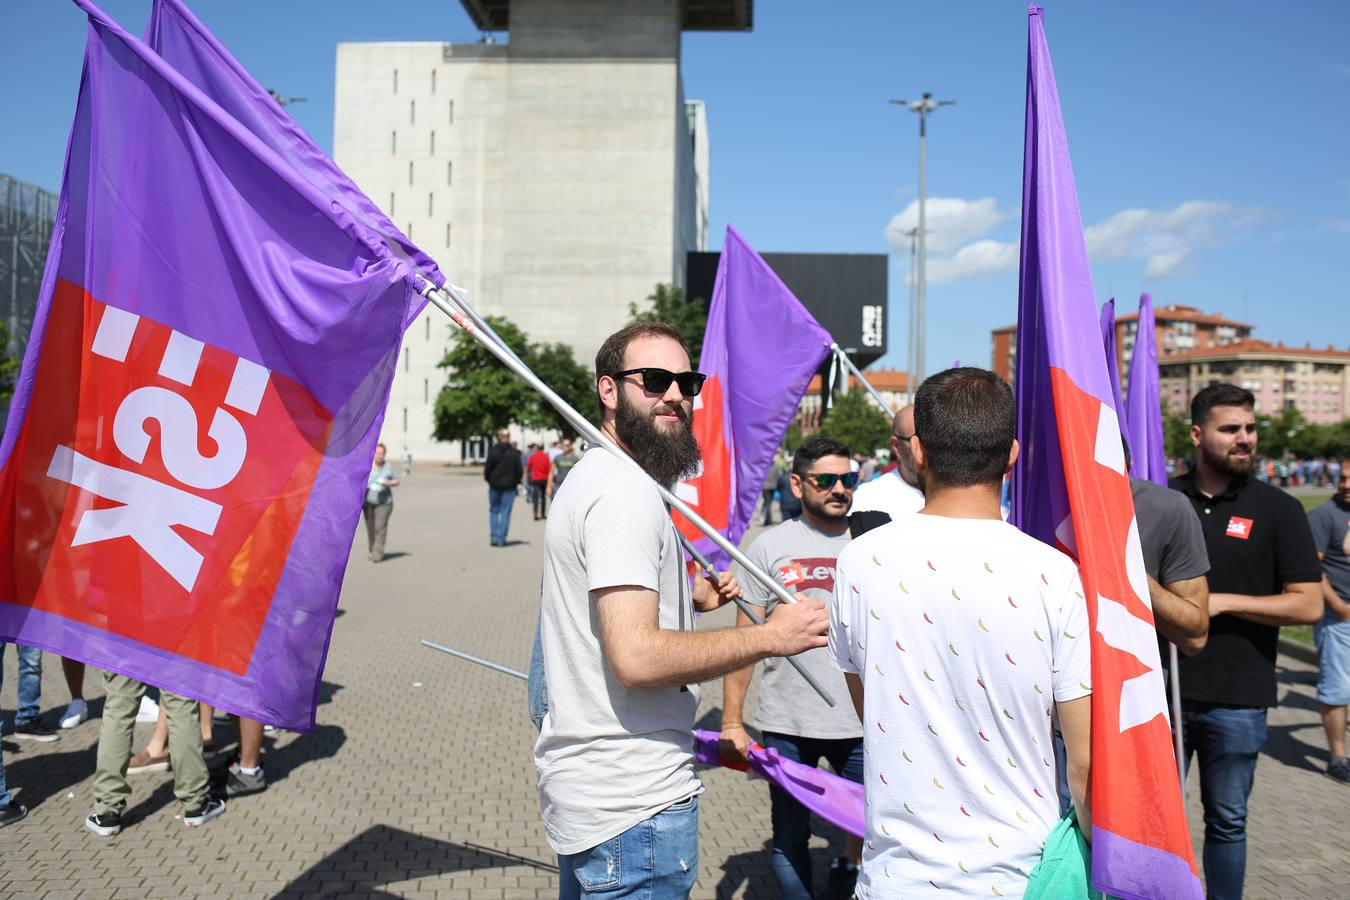 Segunda jornada de huelga en el metal de Bizkaia